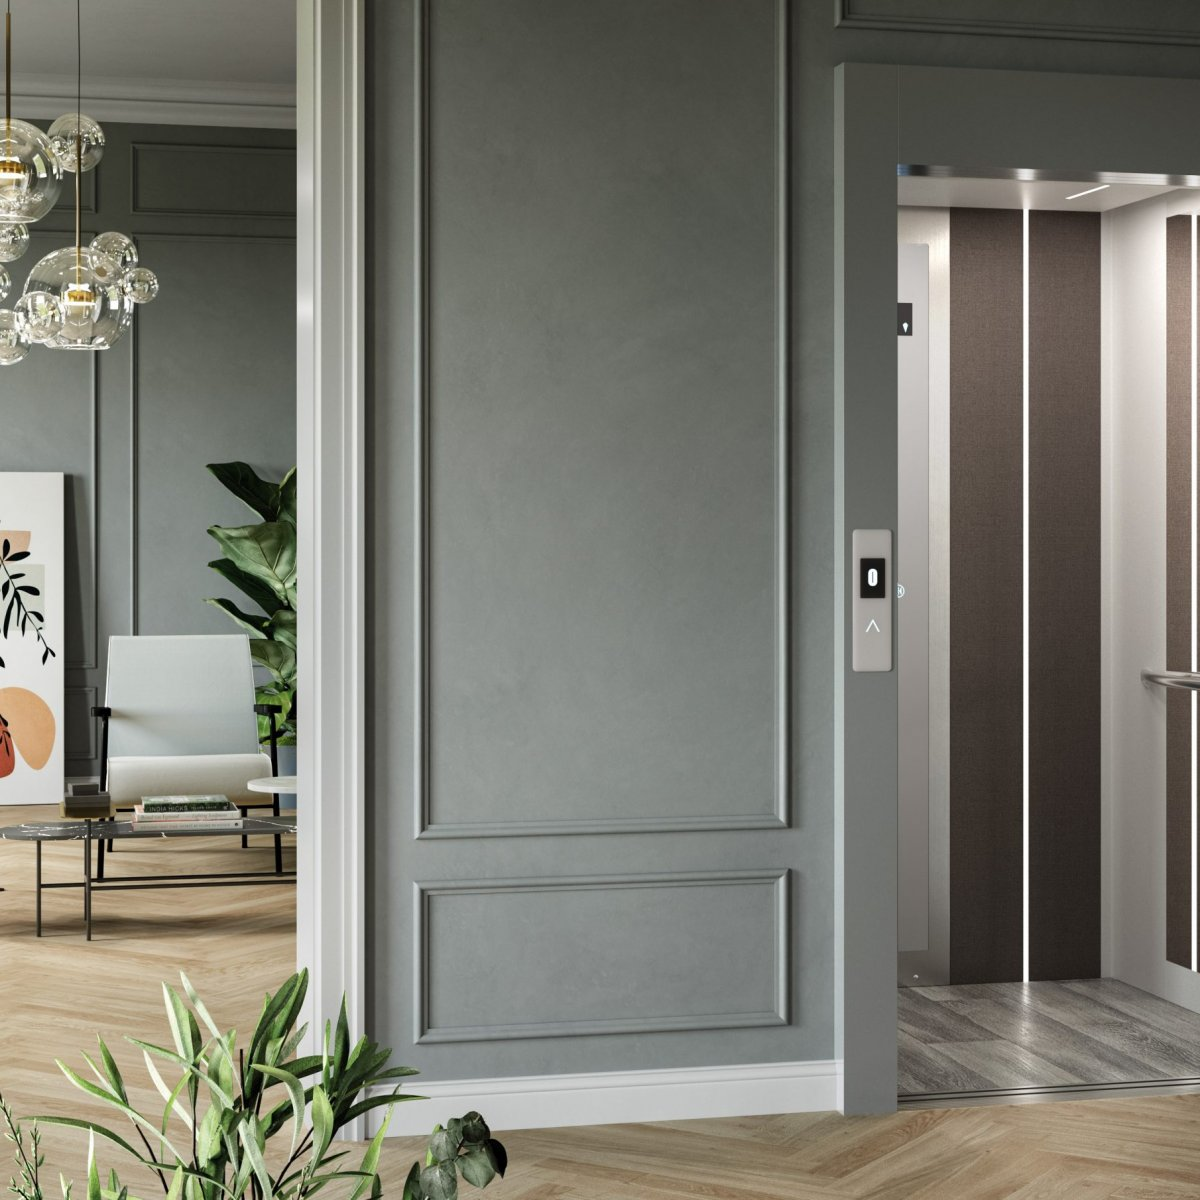 Home Lift   Simplex Elevators Gallery Image 8